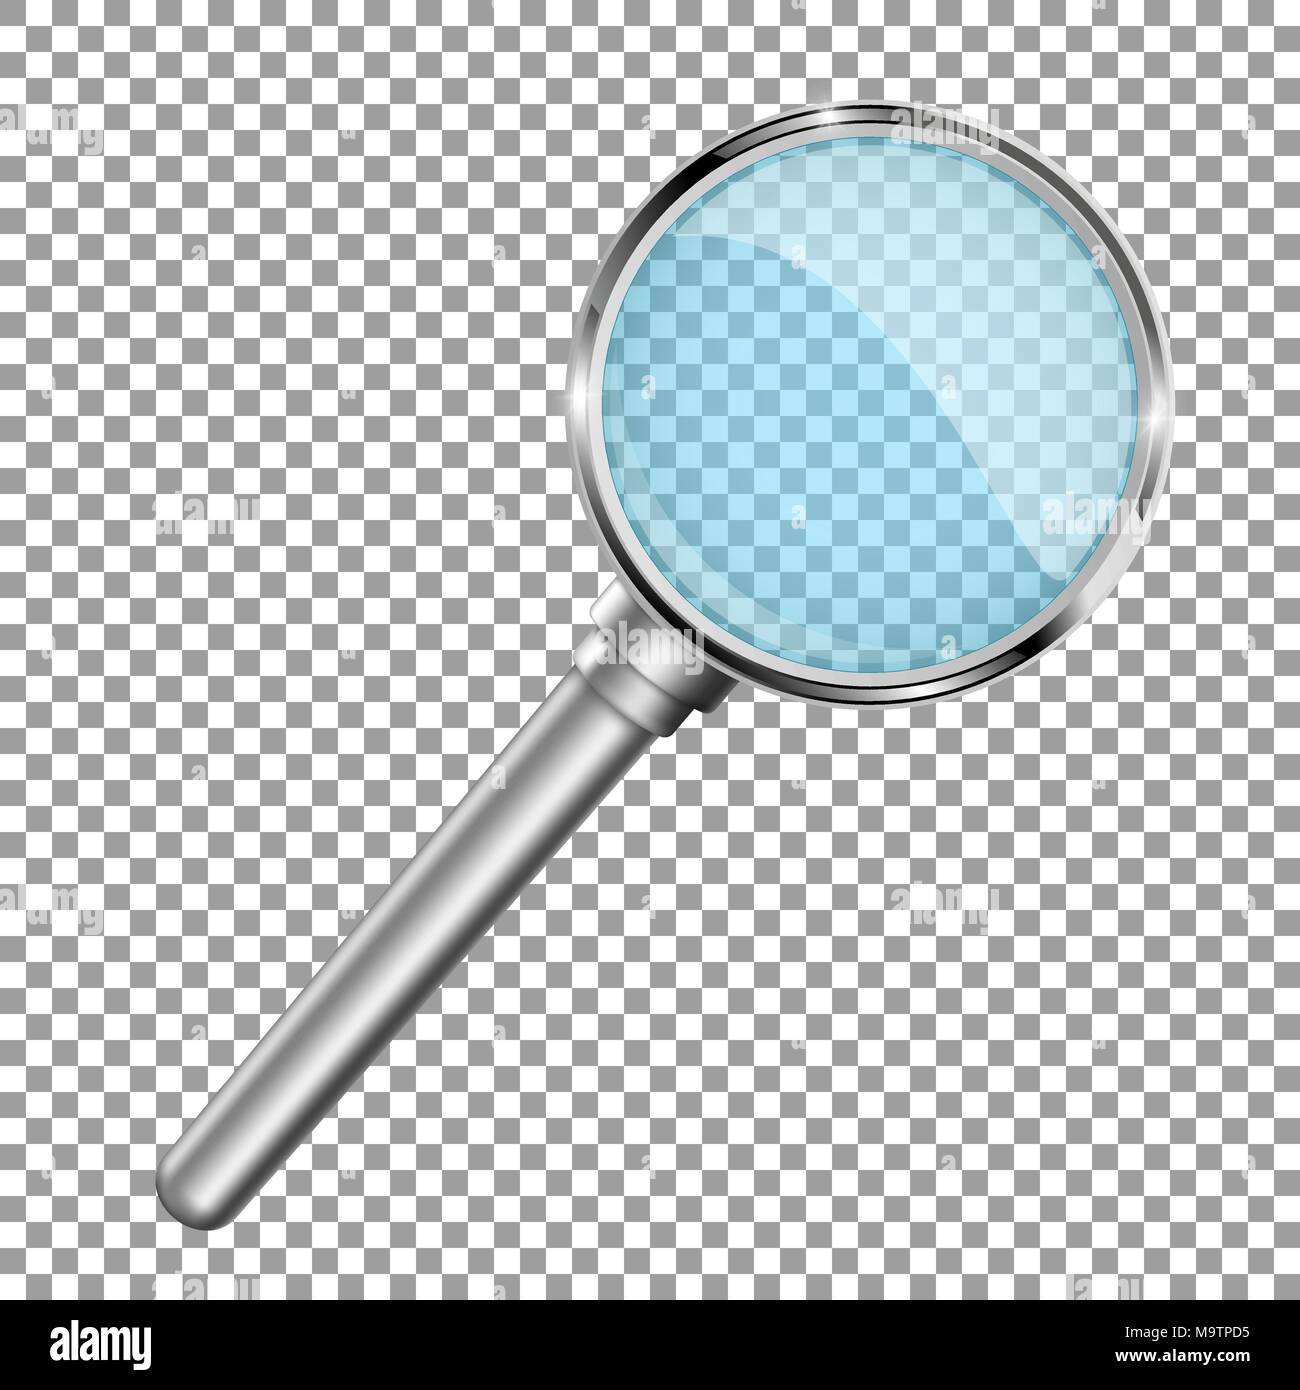 Transparent magnifying glass. Vector 3d illustration - Stock Image